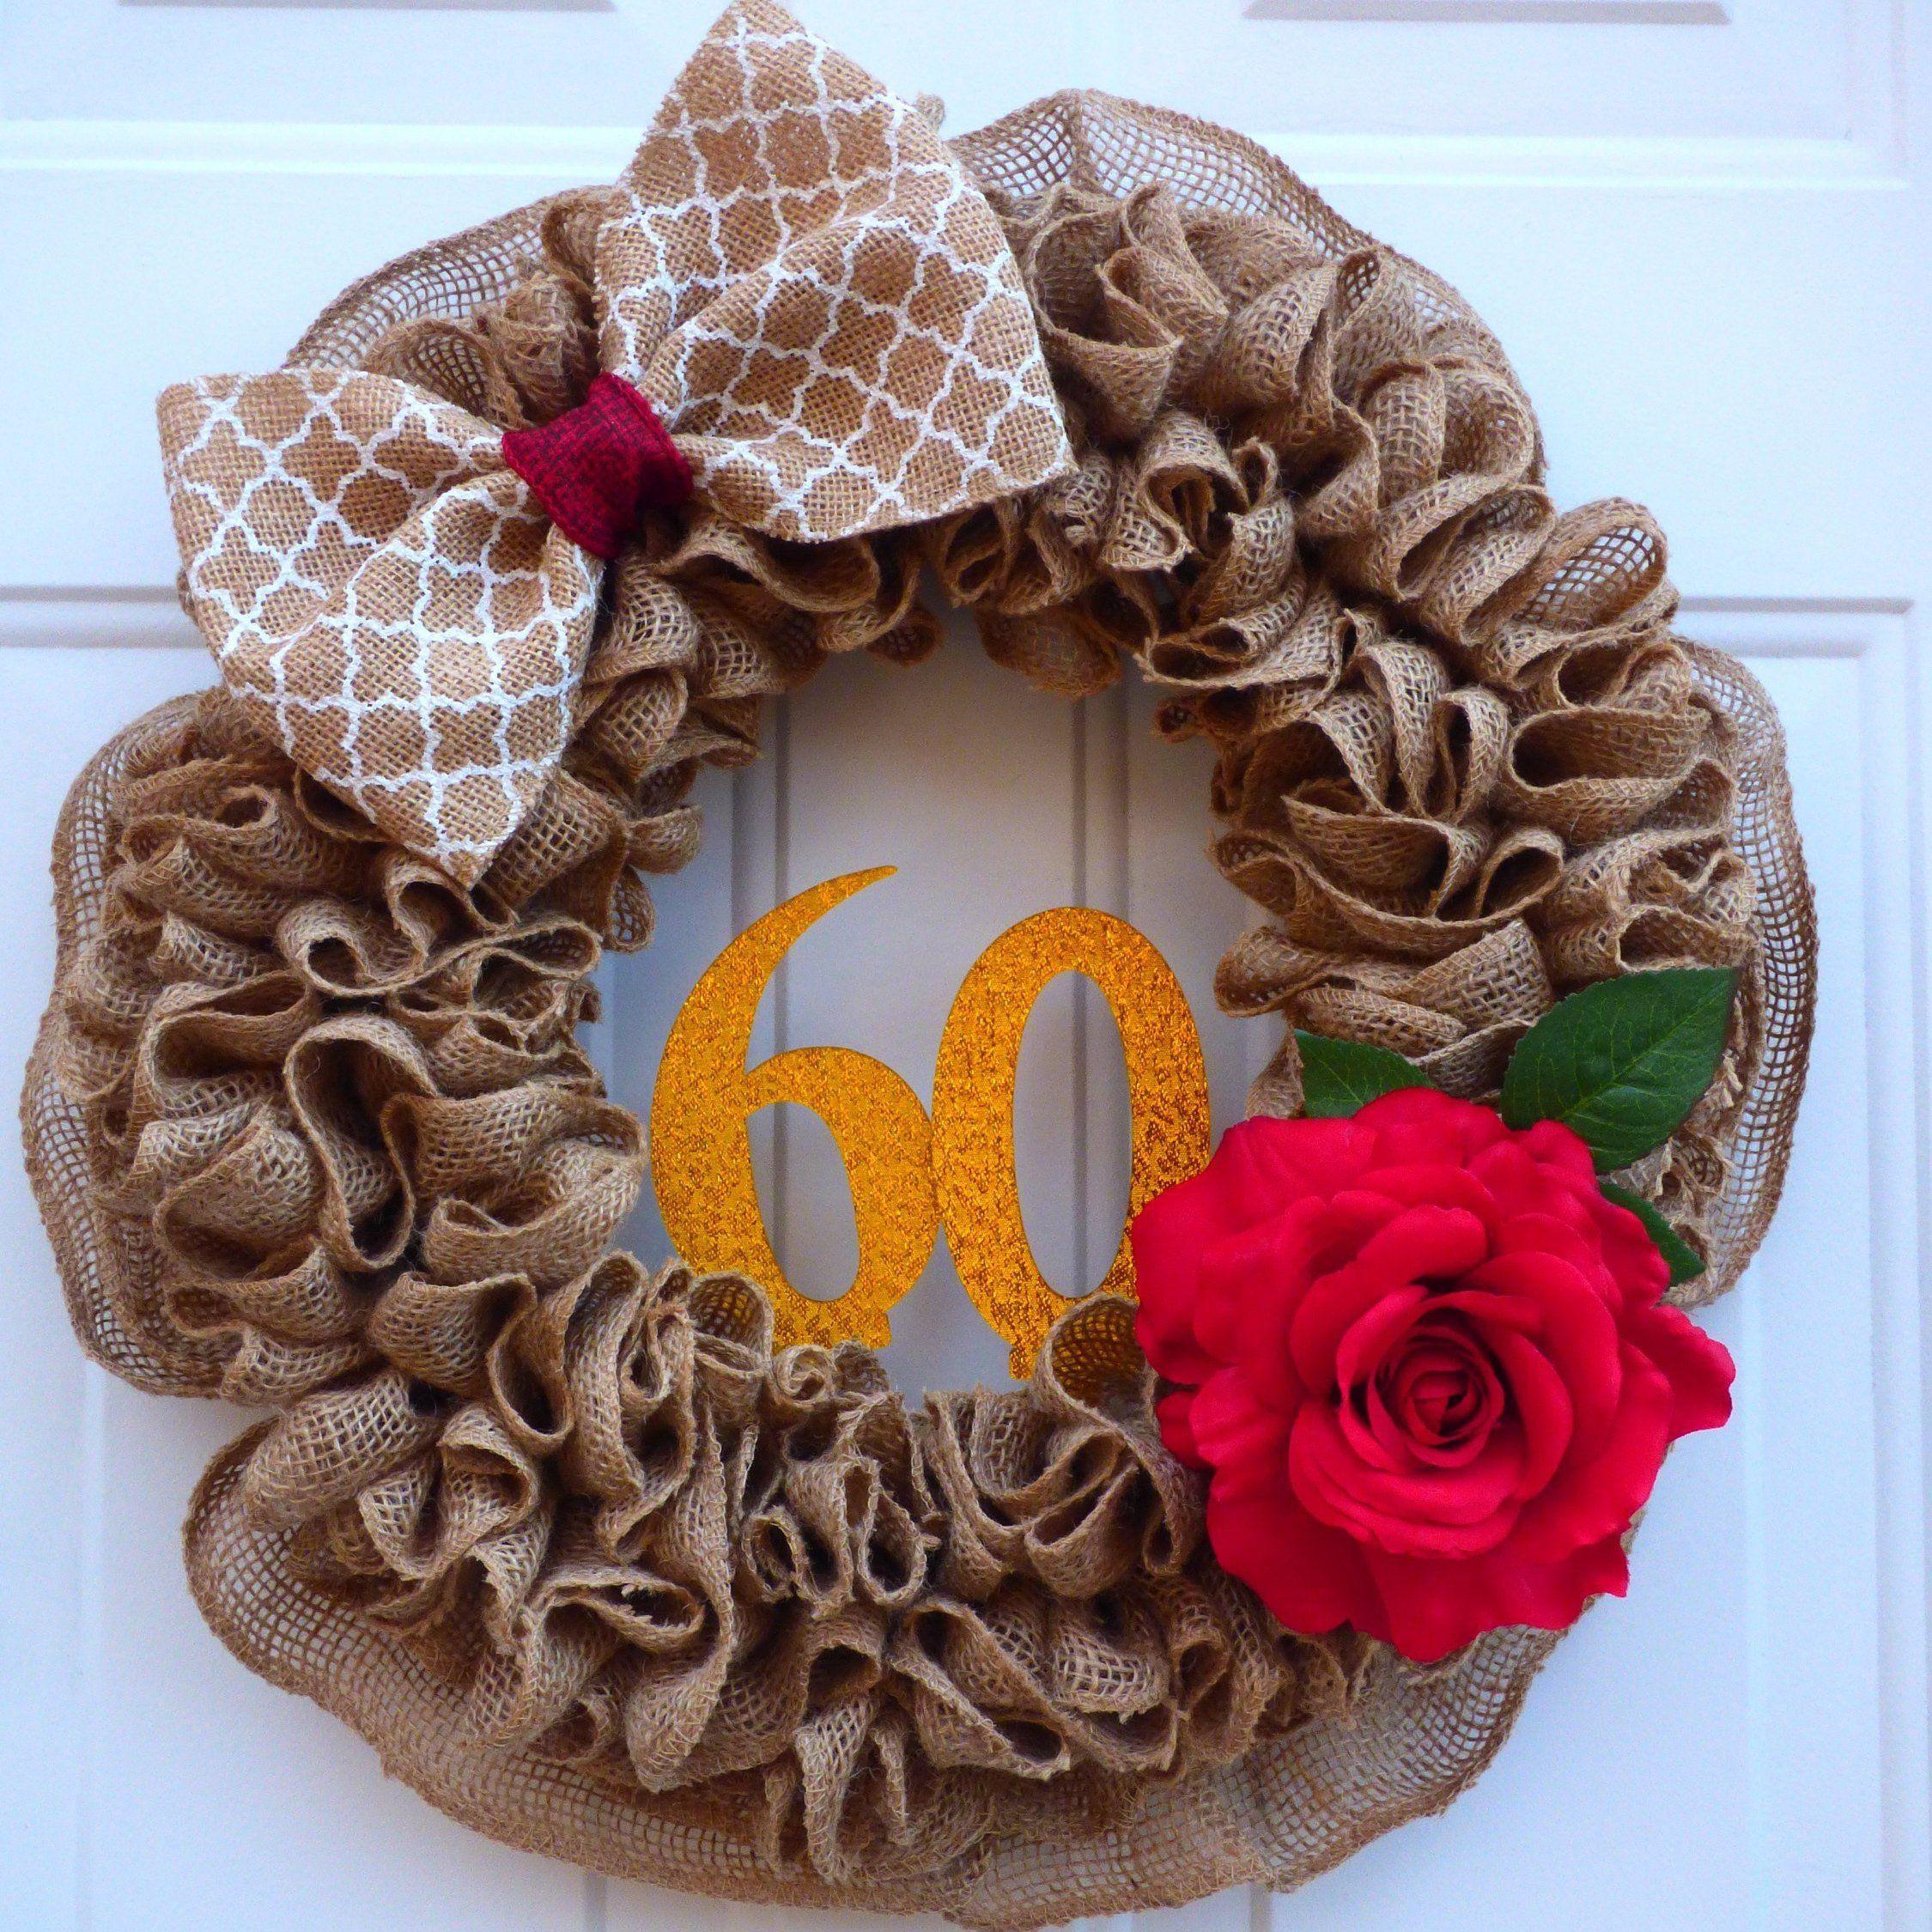 60 birthday decorations 60 birthday gifts for women mom